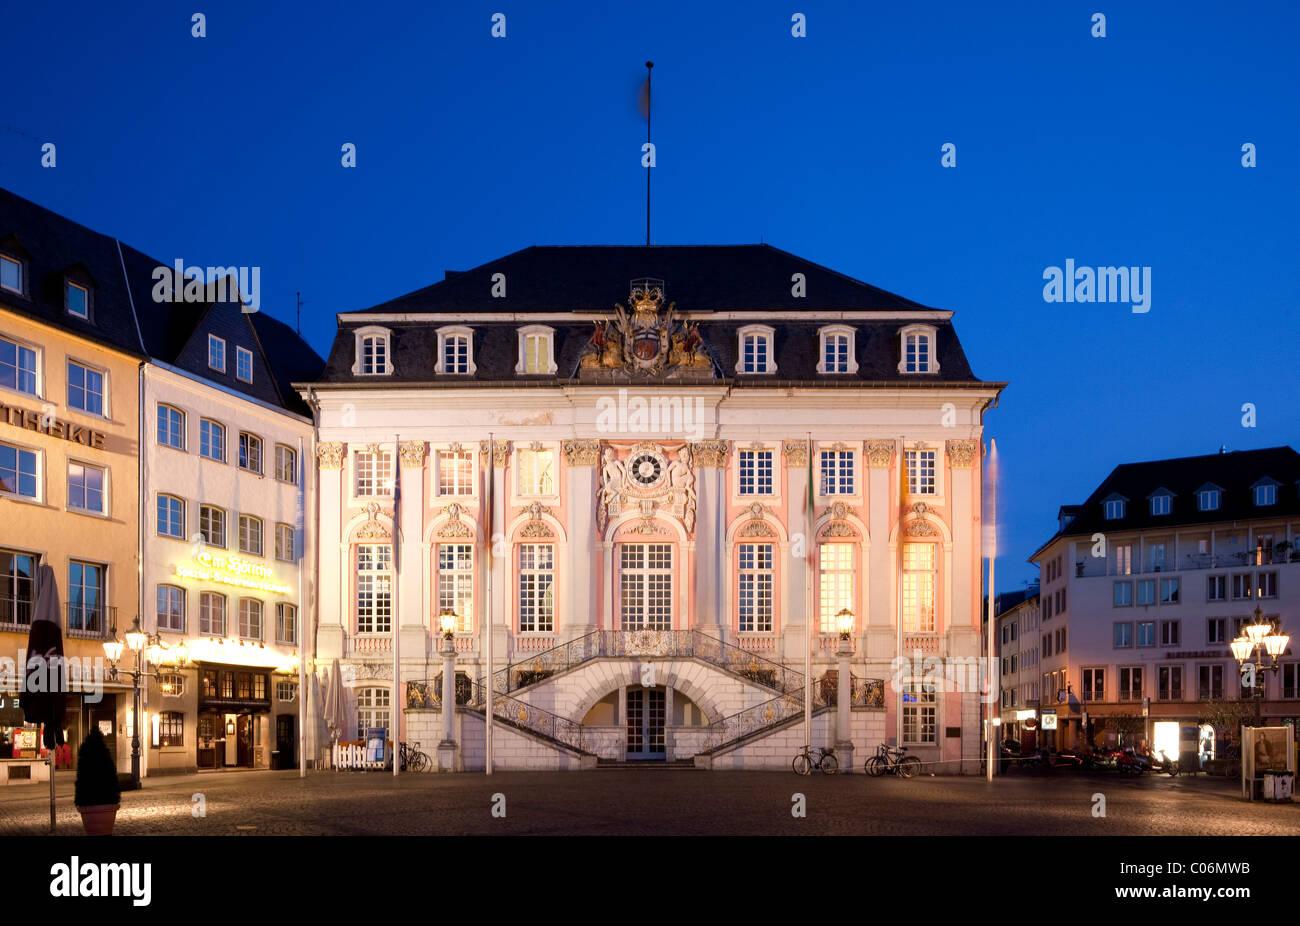 Old Town Hall, Bonn, Rhineland, North Rhine-Westphalia, Germany, Europe - Stock Image